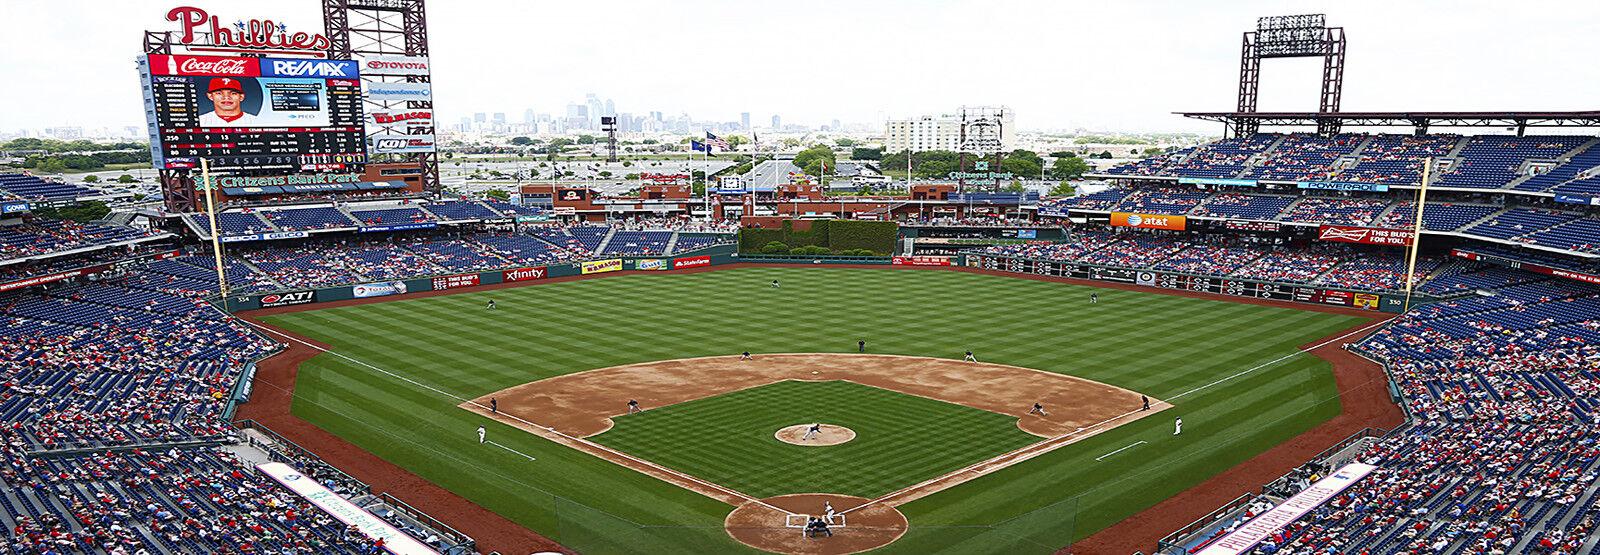 Boston Red Sox Tickets Stubhub